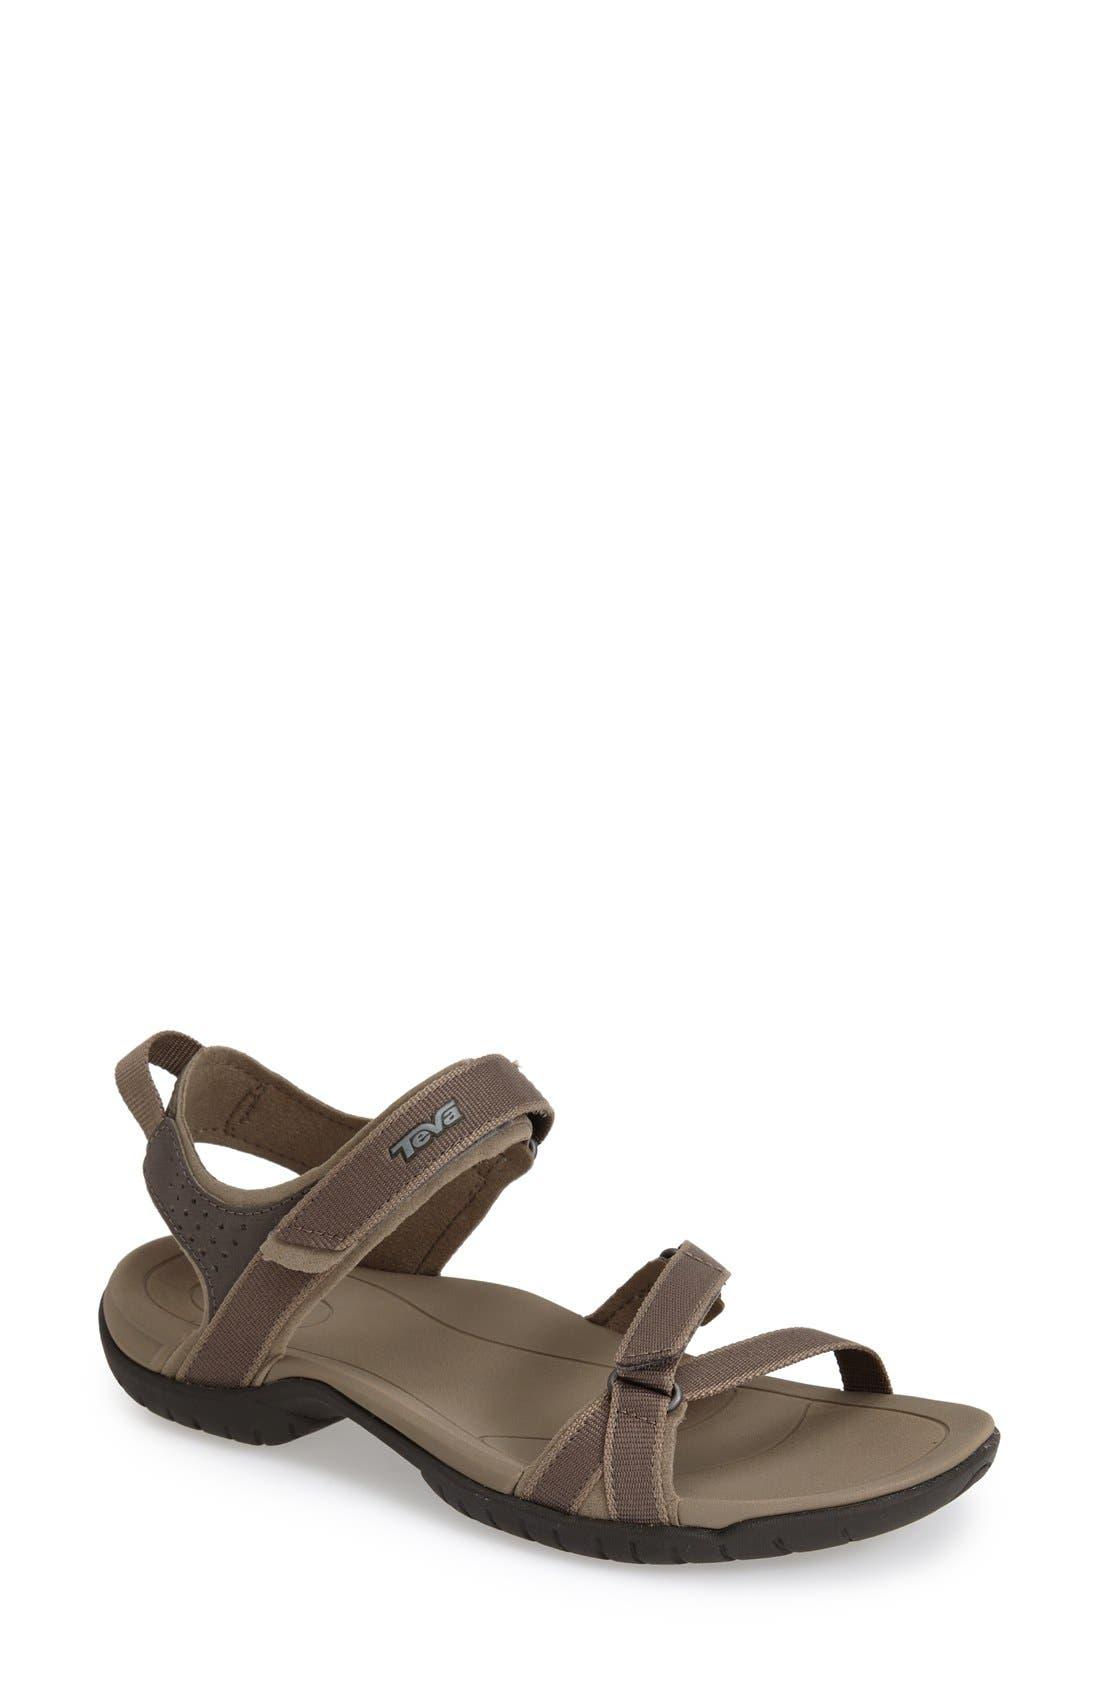 'Verra' Sandal,                             Main thumbnail 1, color,                             Bungee Cord